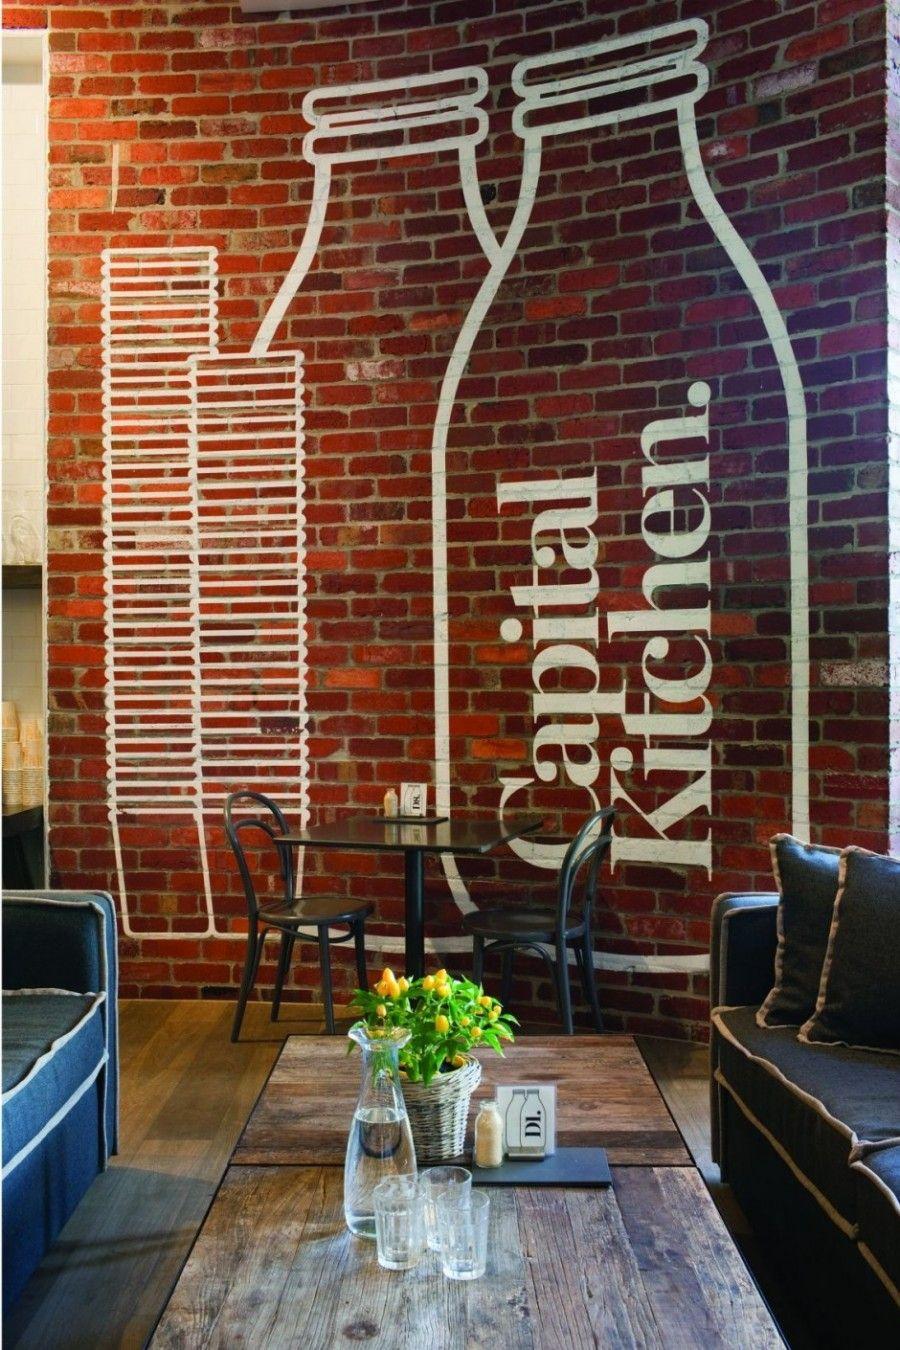 painted graphics on exposed brick wall  brick interior